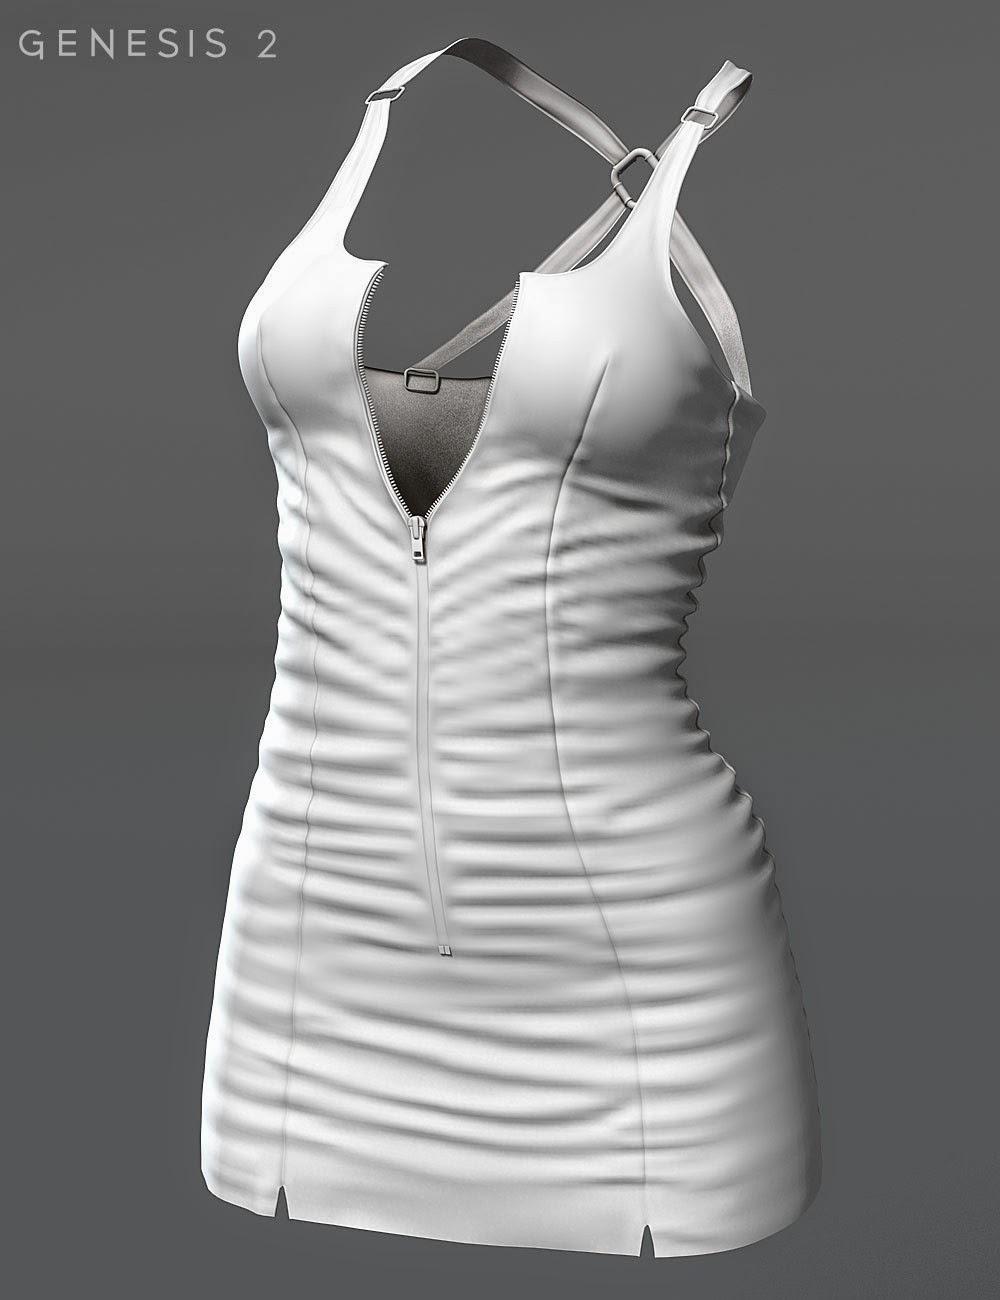 TEC5 for Genesis 2 Female